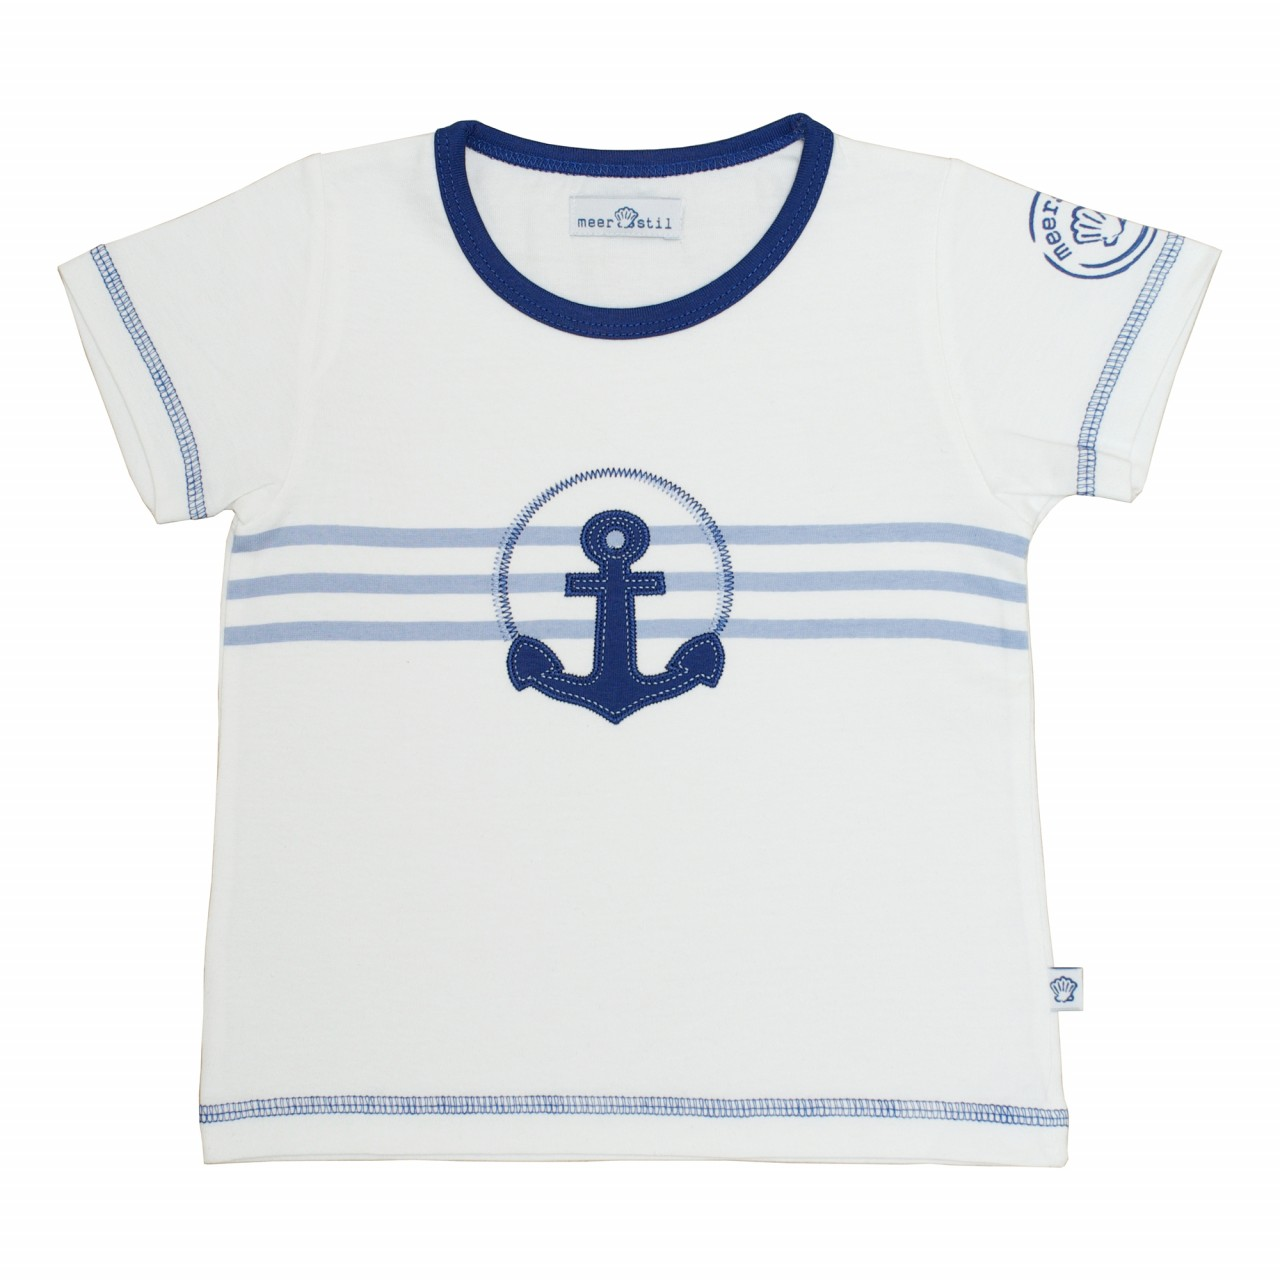 Kindershirt, Anker